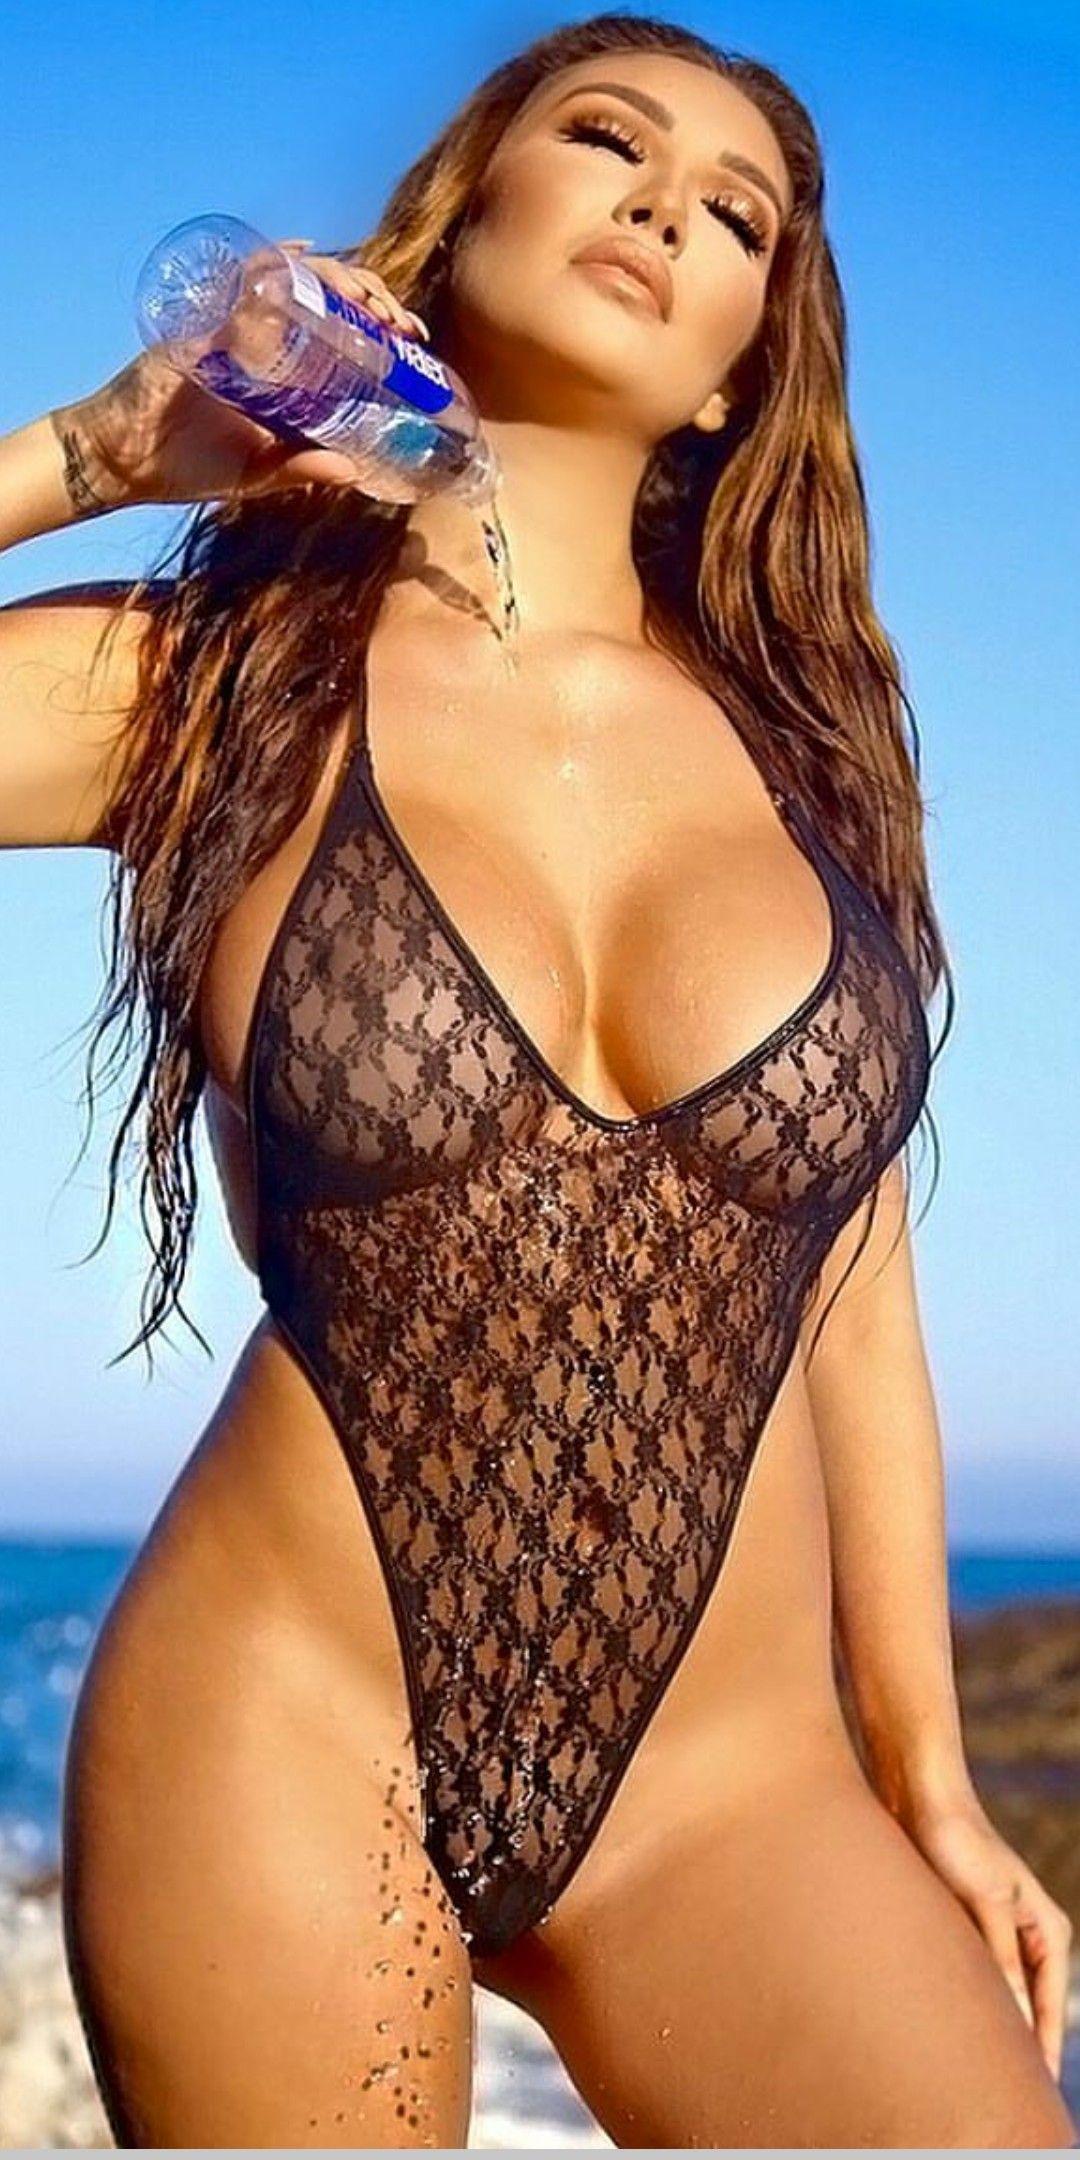 Only for teacher sexy girl bikini photo — photo 10